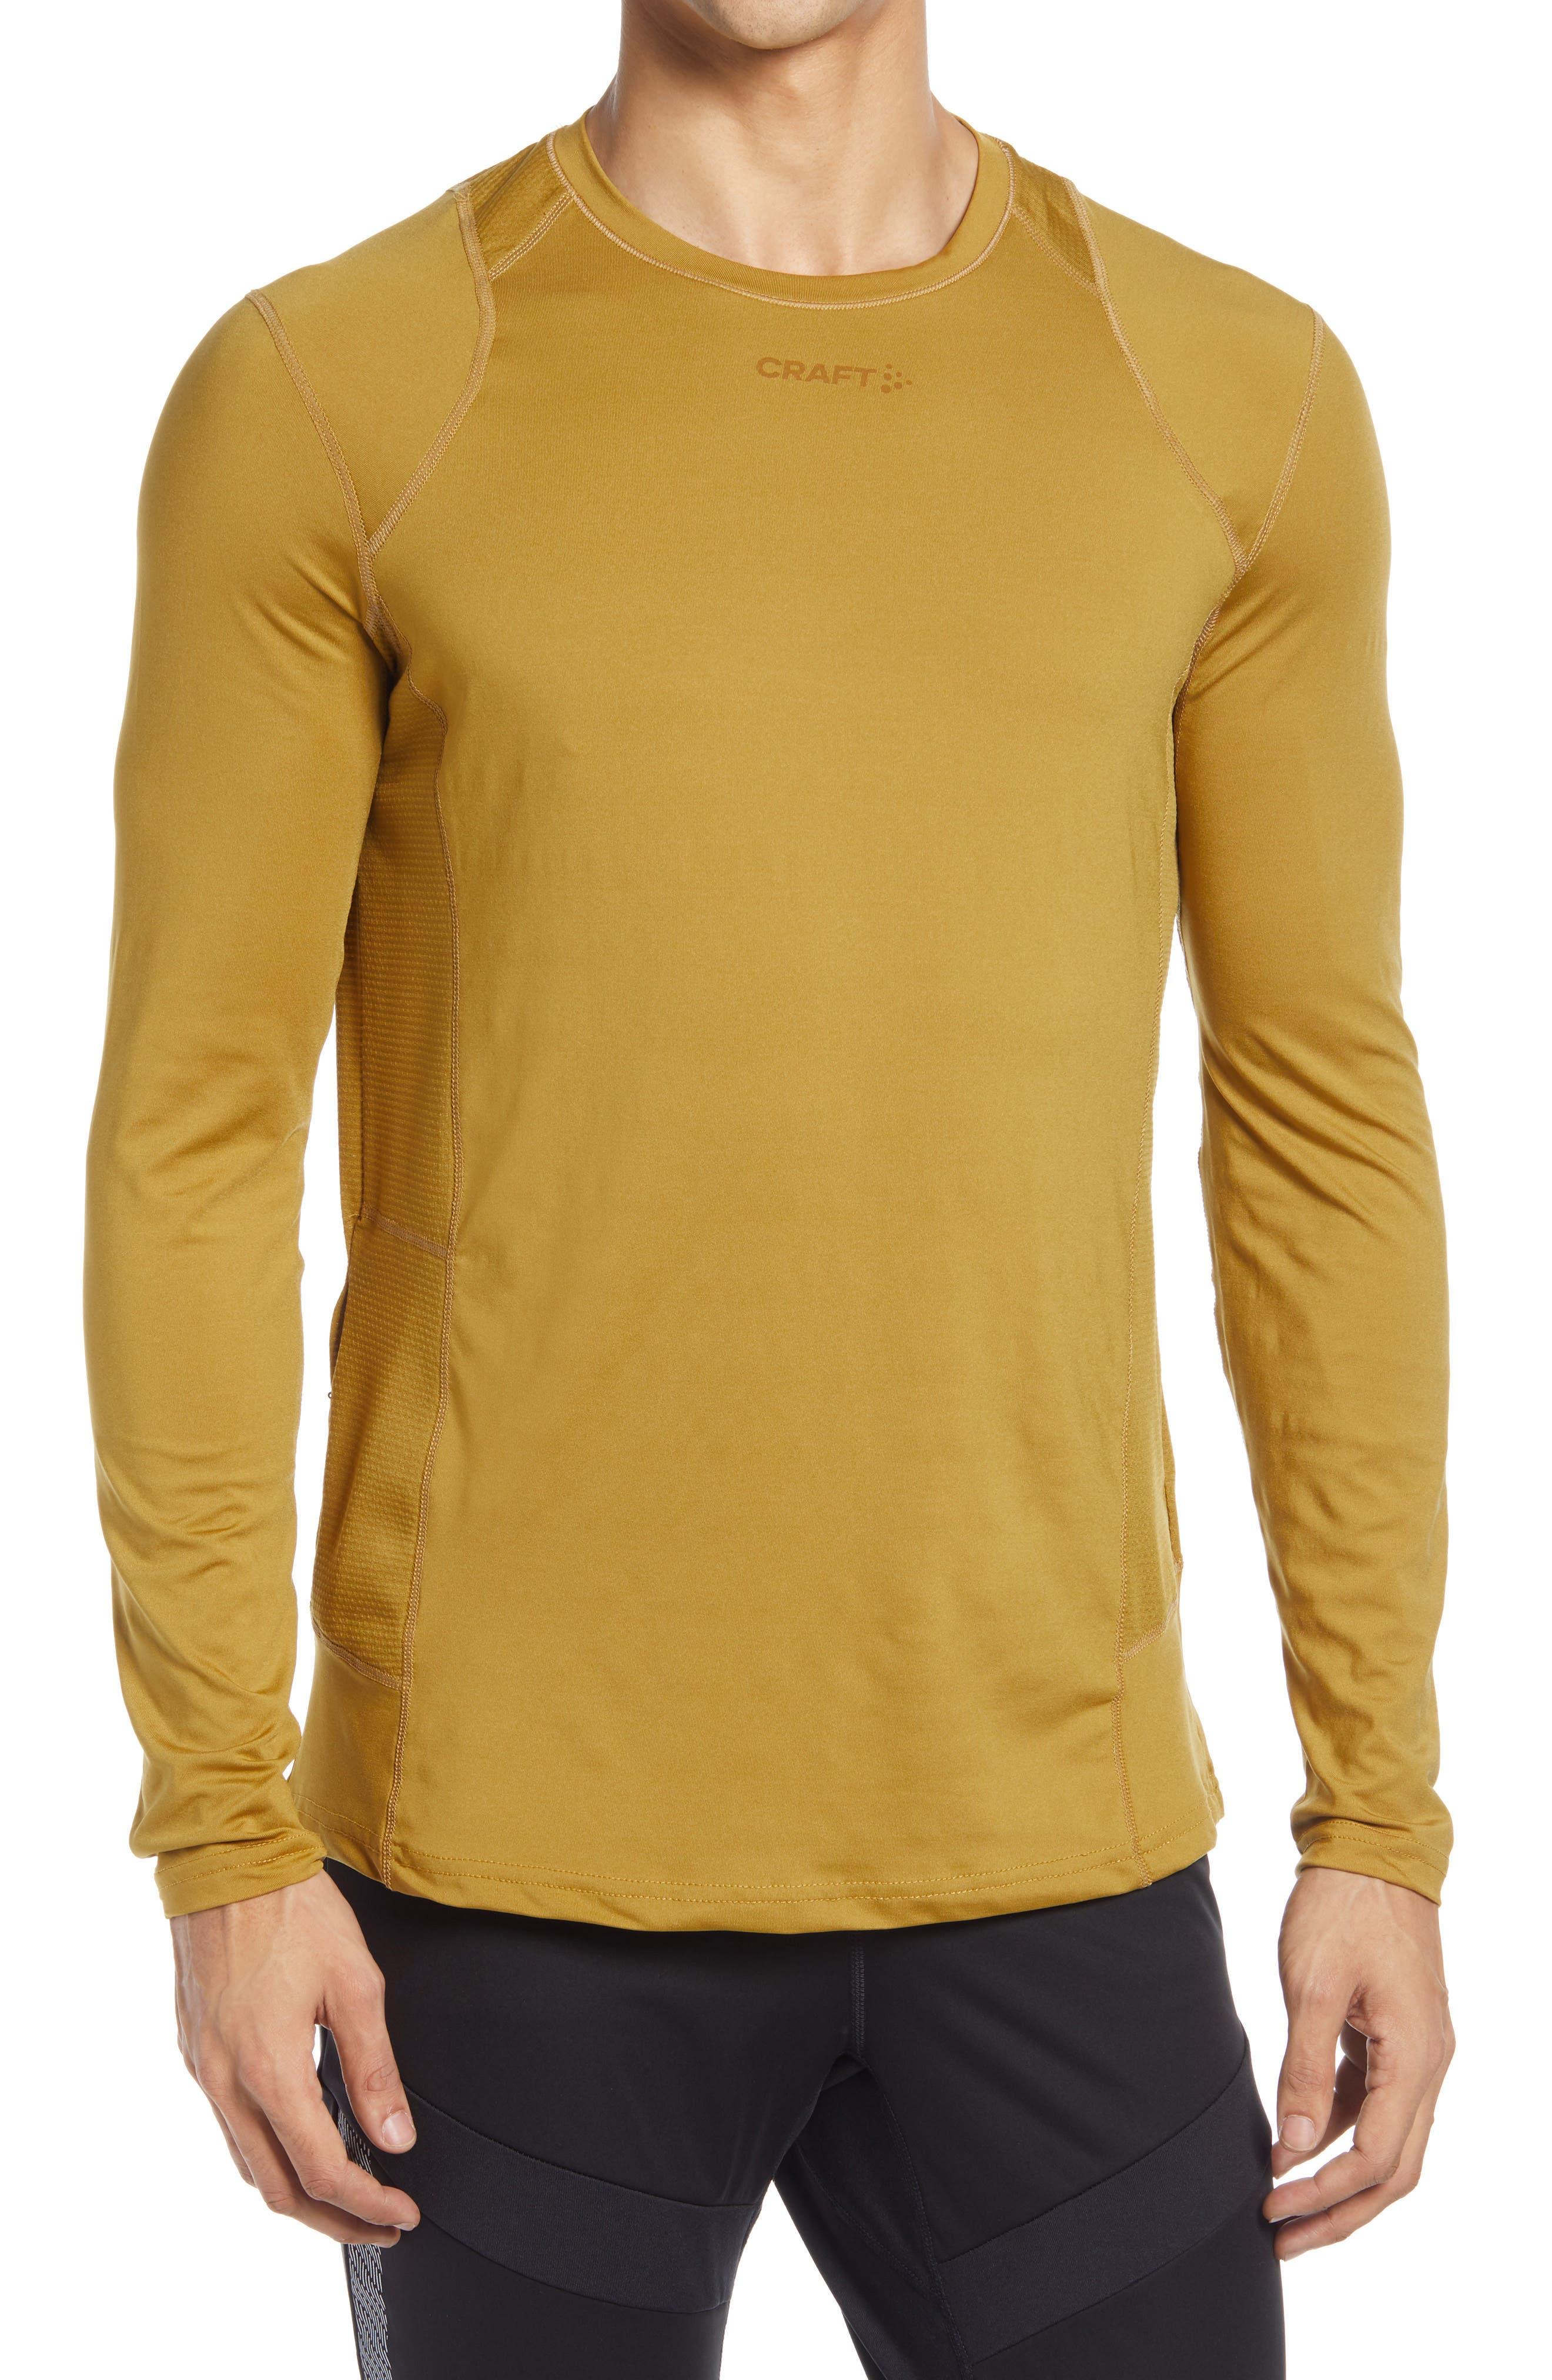 Adv Essence Men's Long Sleeve Performance T-Shirt